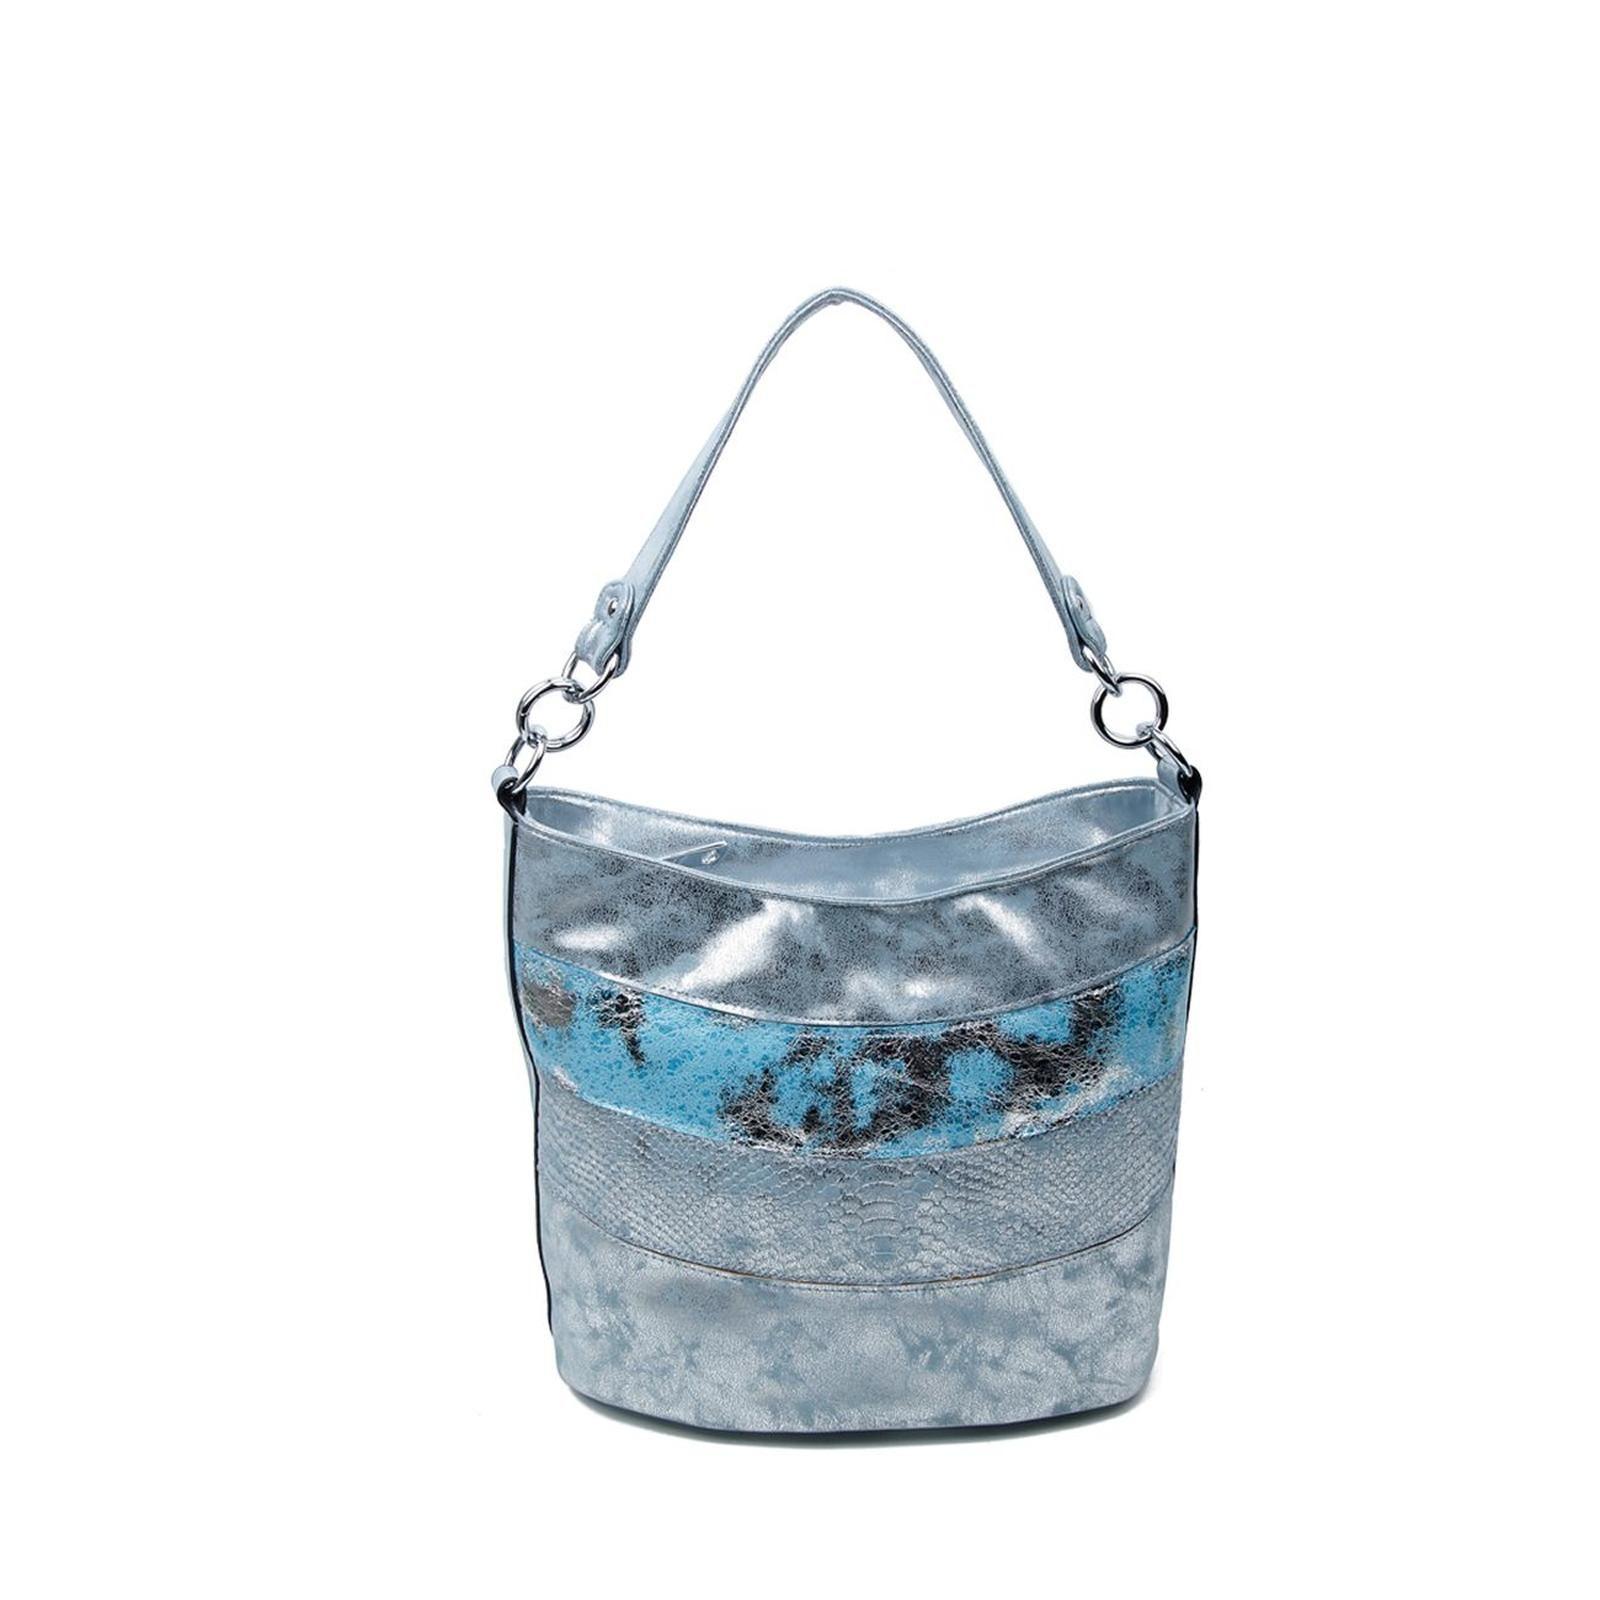 019d98b243013 OBC DAMEN TASCHE SHOPPER METALLIC Henkeltasche Schultertasche Umhängetasche  Handtasche Beuteltasche Hobo-Bag Handtasche Blau